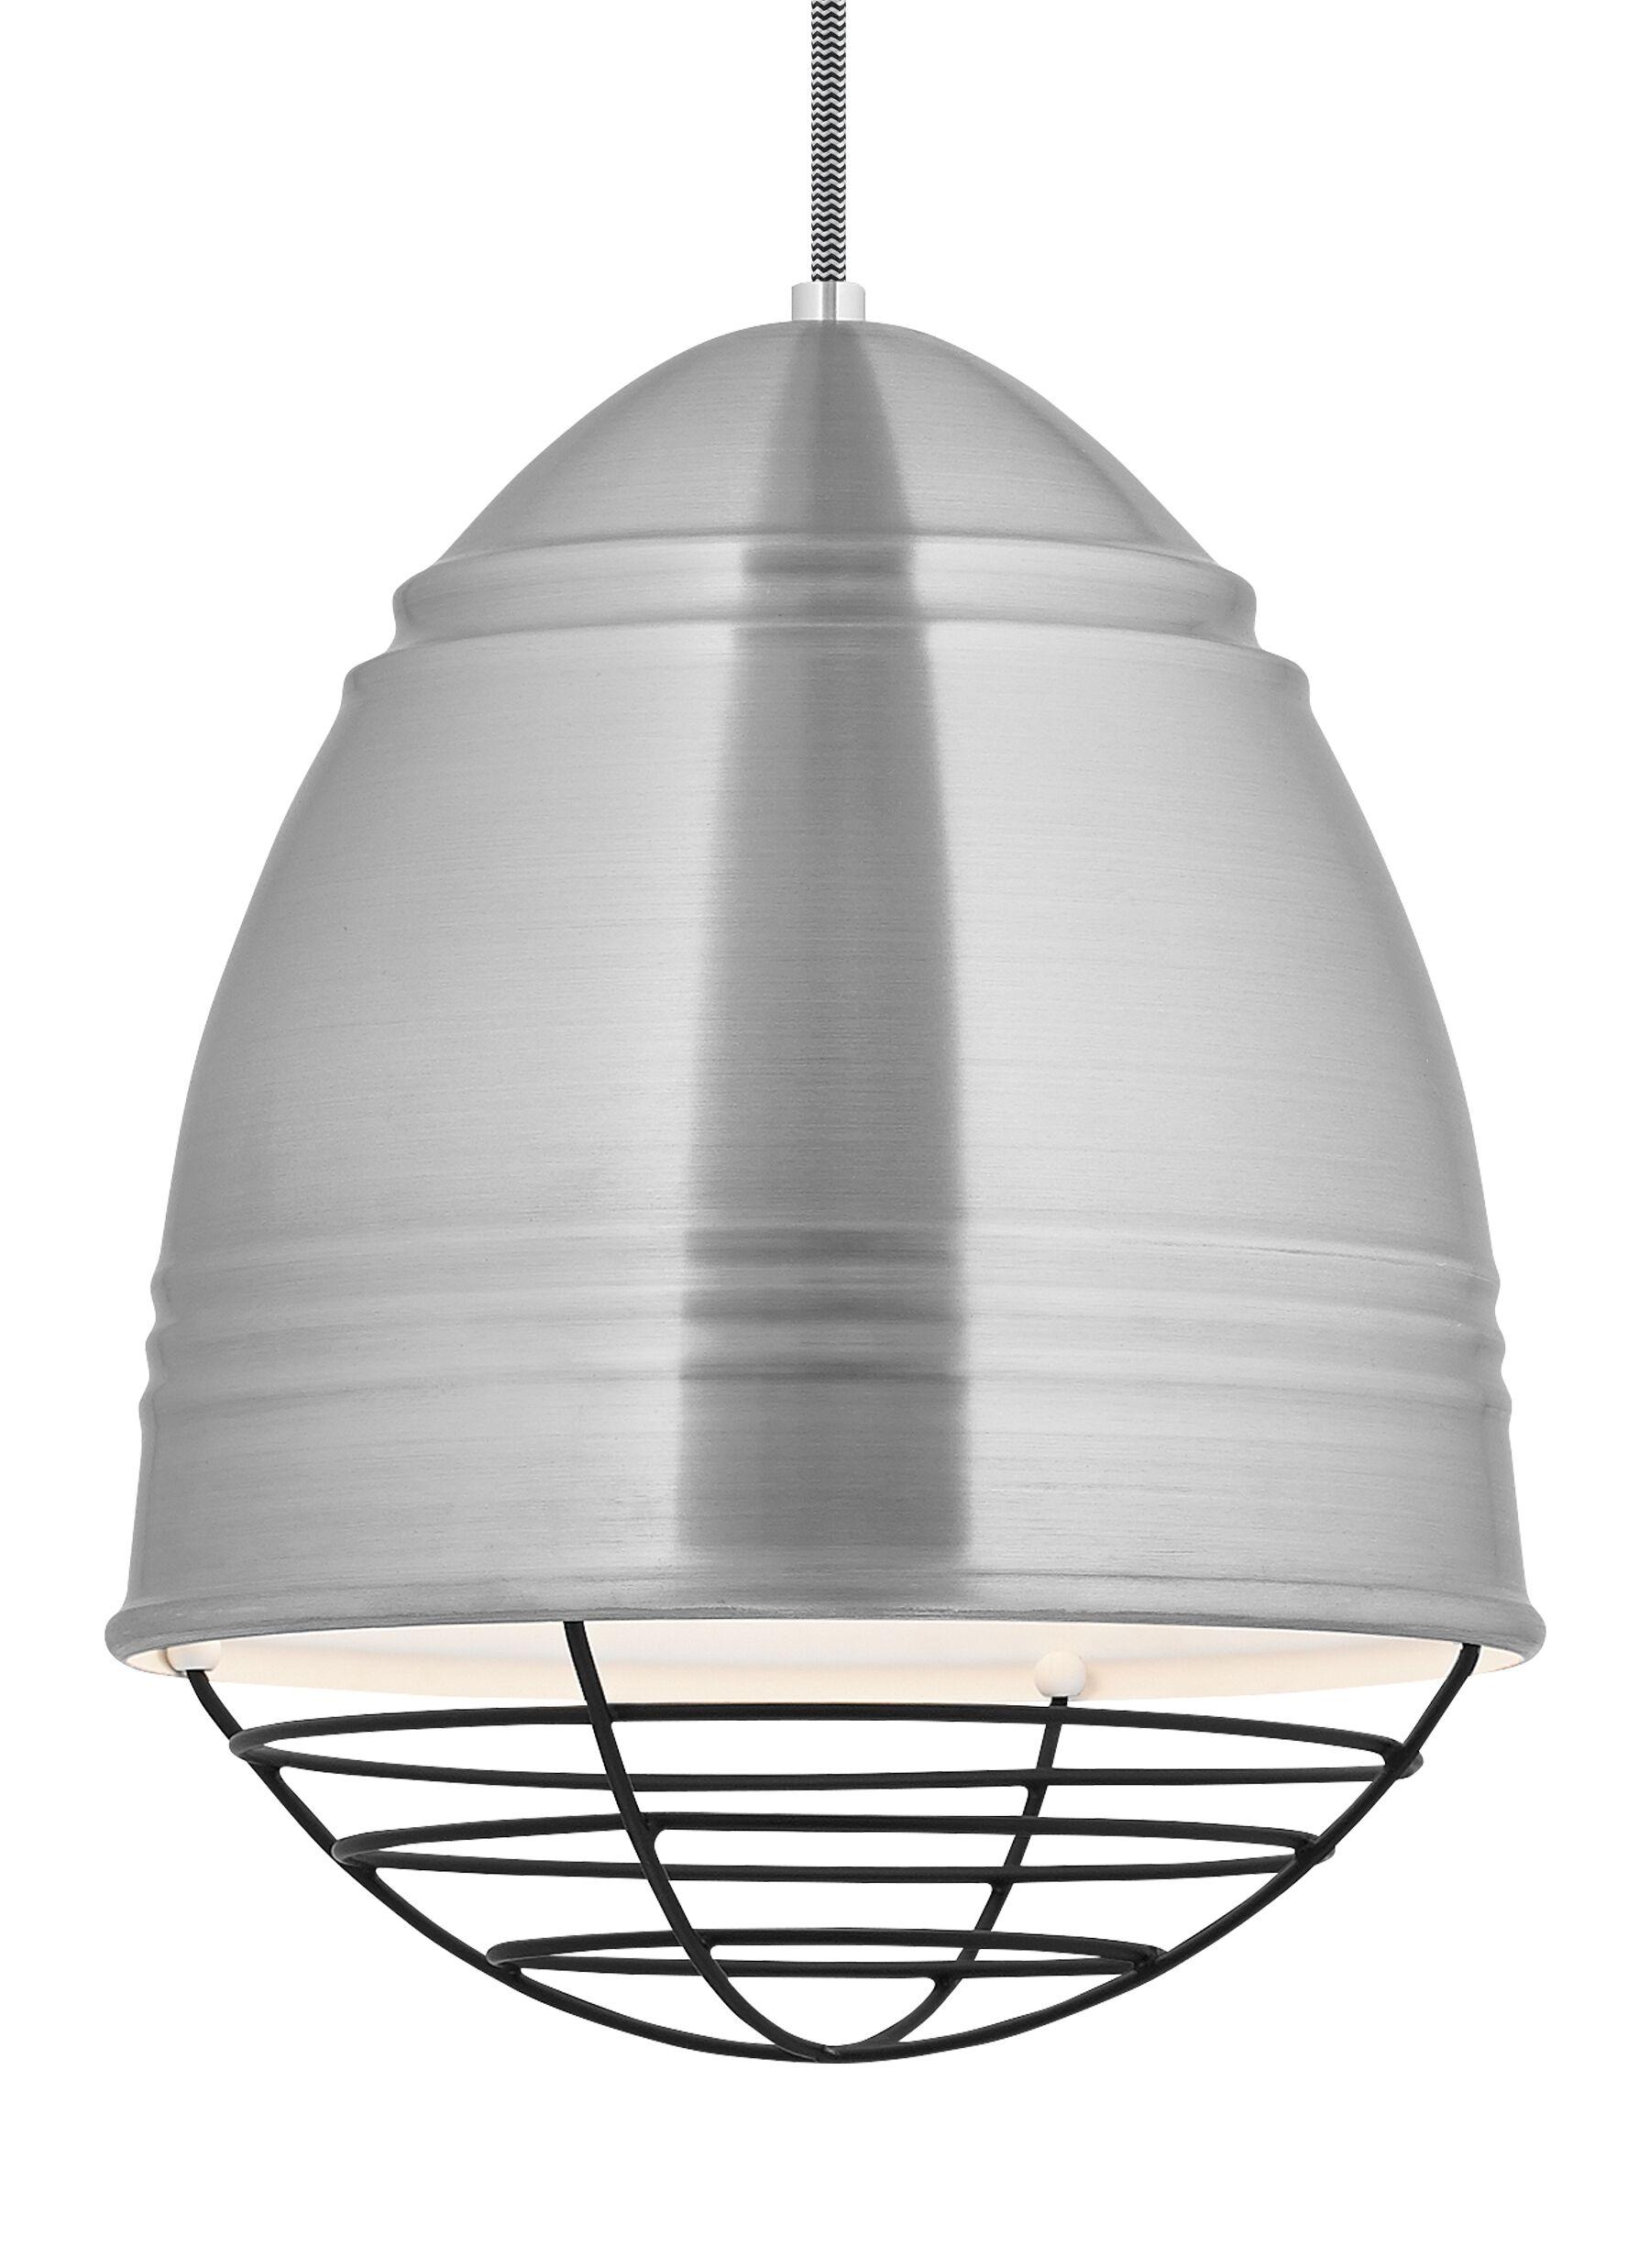 Else 1-Light Bell Pendant Finish: Black, Shade Color: Brushed Aluminum/White Interior